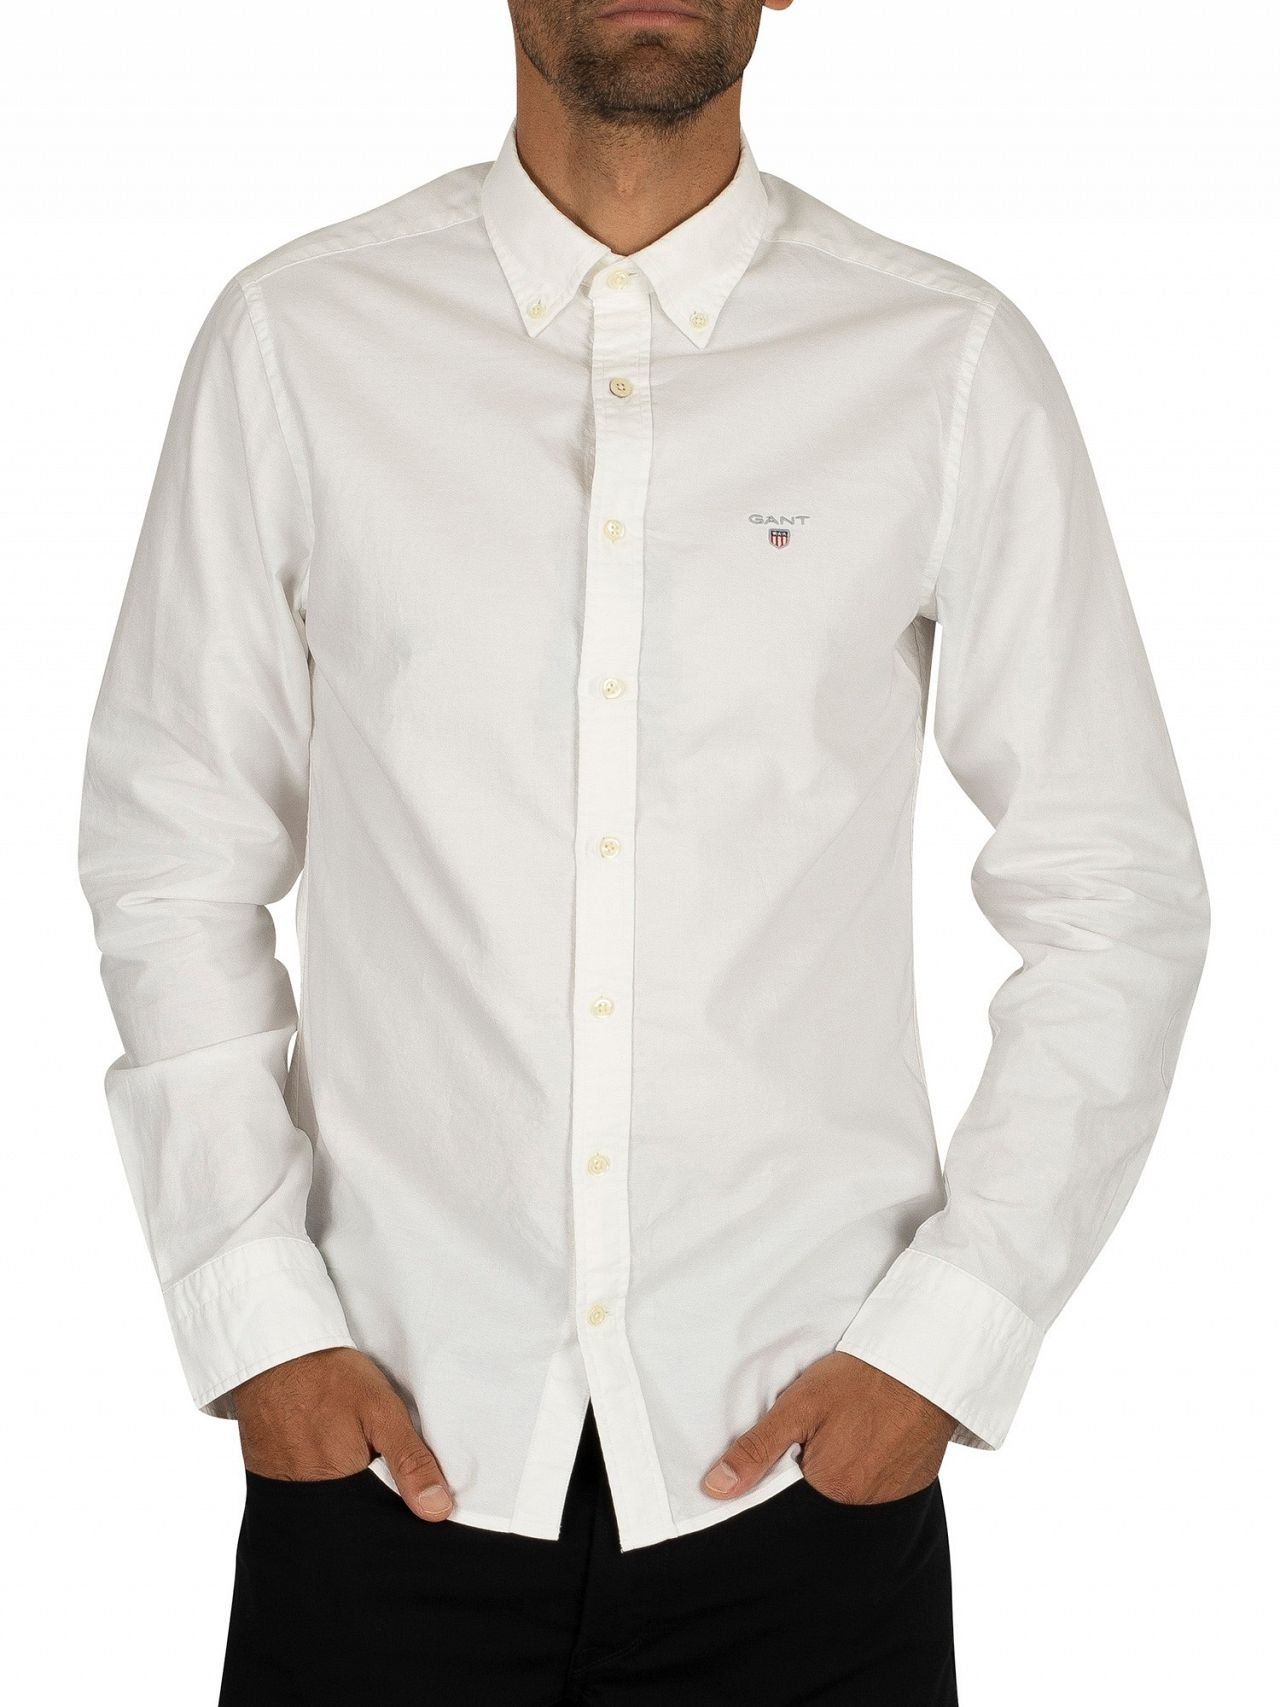 6114d3db Gant White The Slim Oxford Shirt   Standout